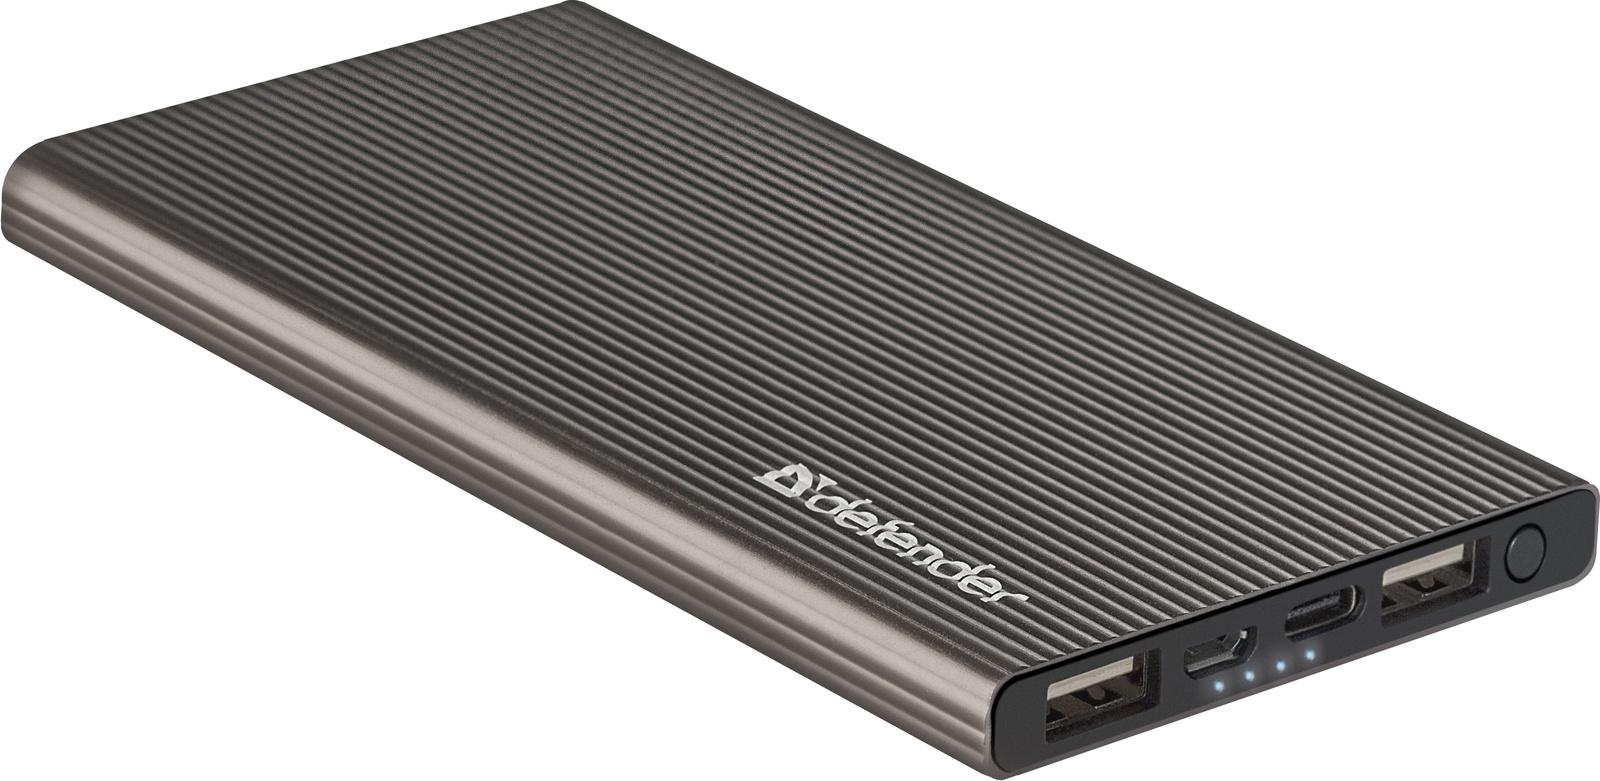 Фото - Внешний аккумулятор Defender ExtraLife Fast, 83627, 5000 mAh, черный аккумулятор